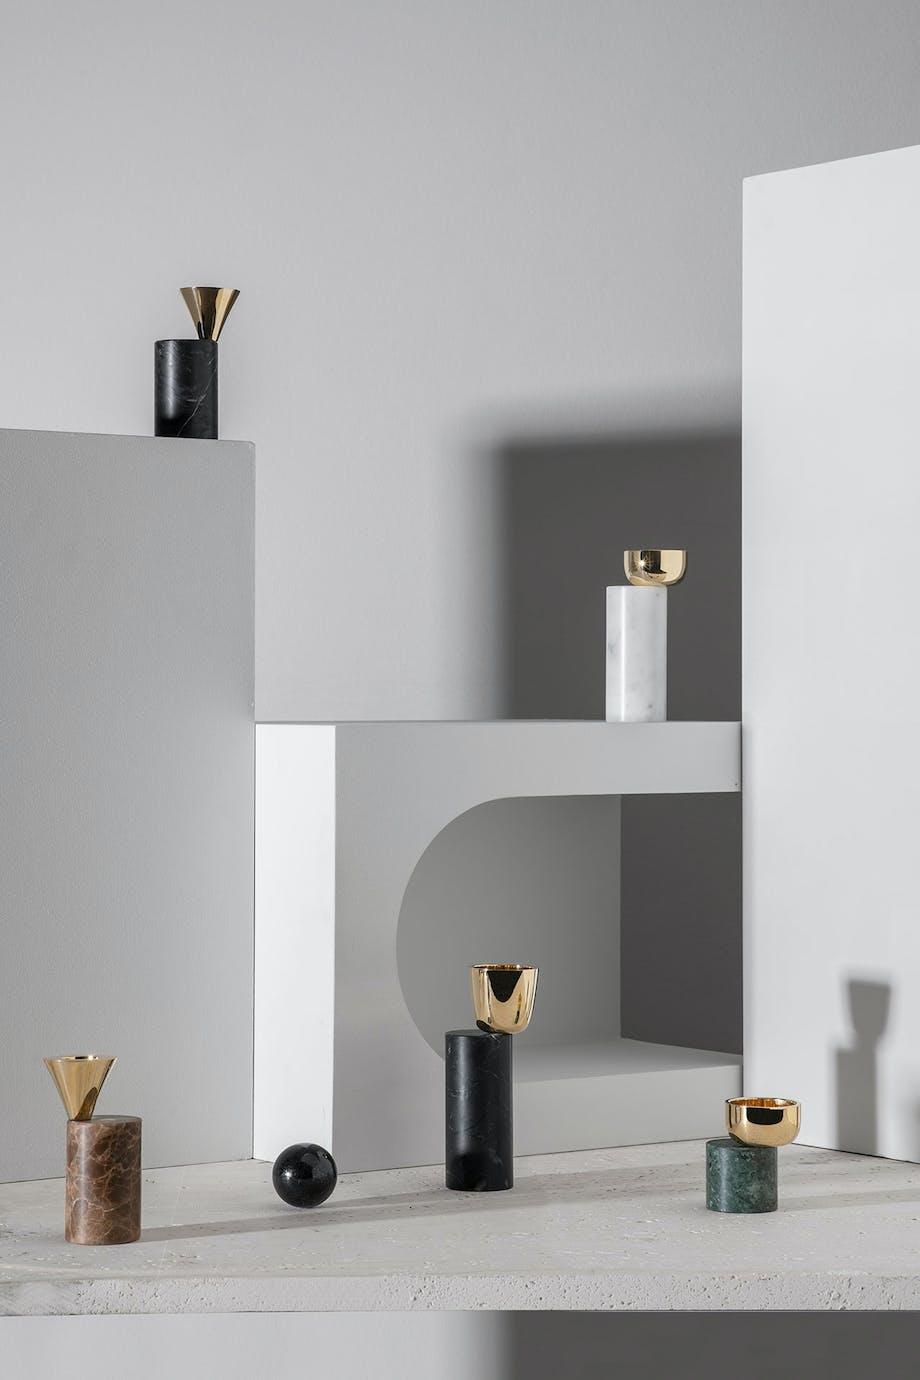 Designer Luca Nichetto har designet disse objekter for Skultuna